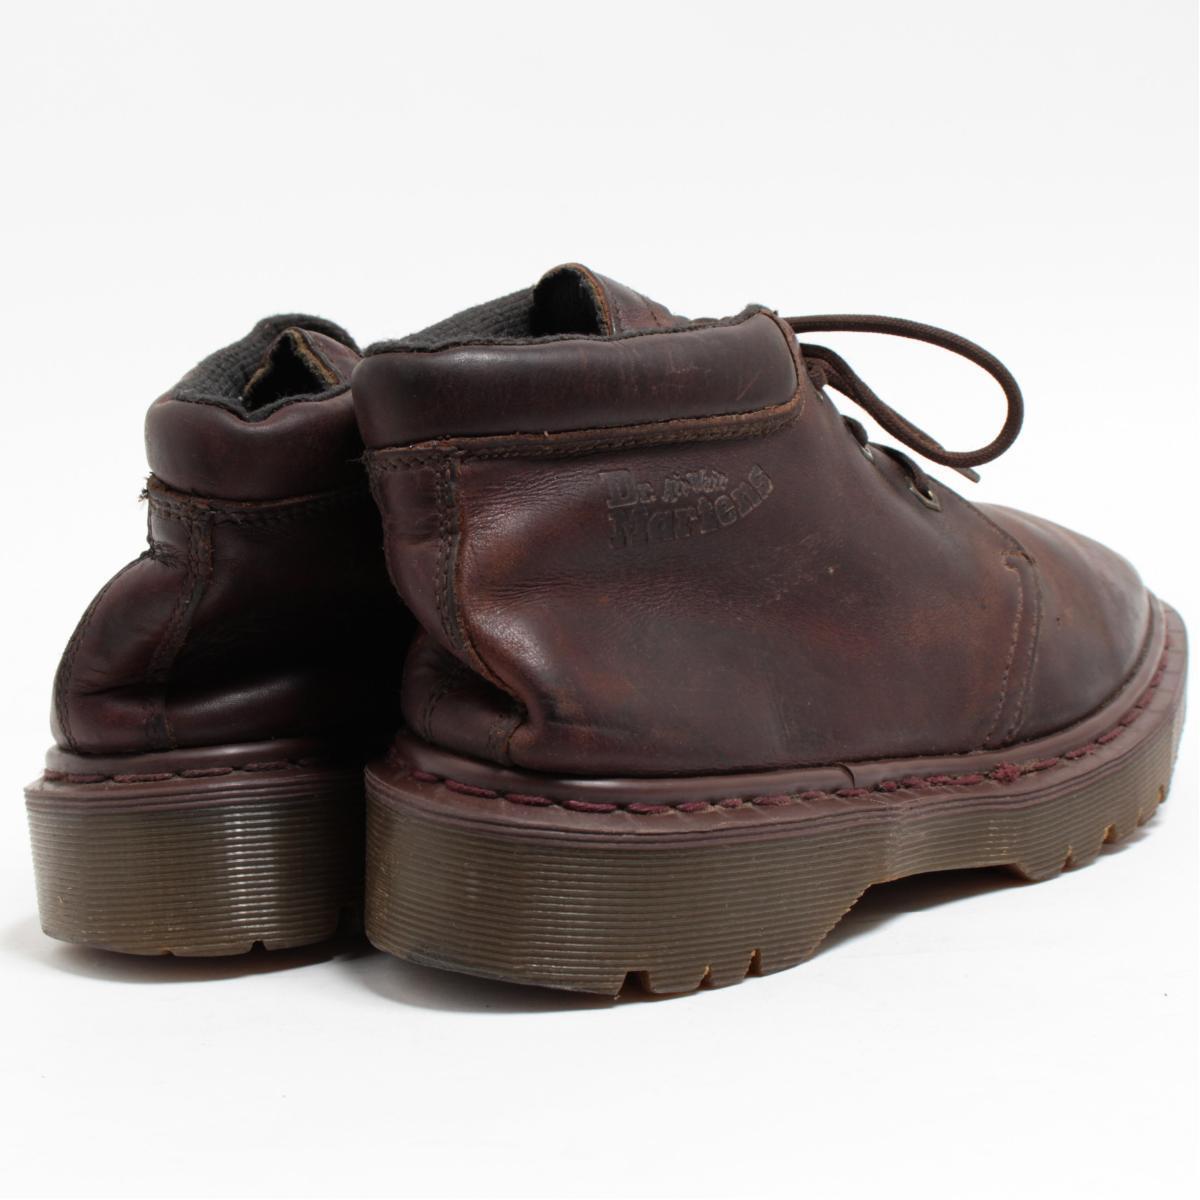 UK9 men 27.5cm /bol7040 made in the doctor Martin Dr.Martens chukka boots U.K.